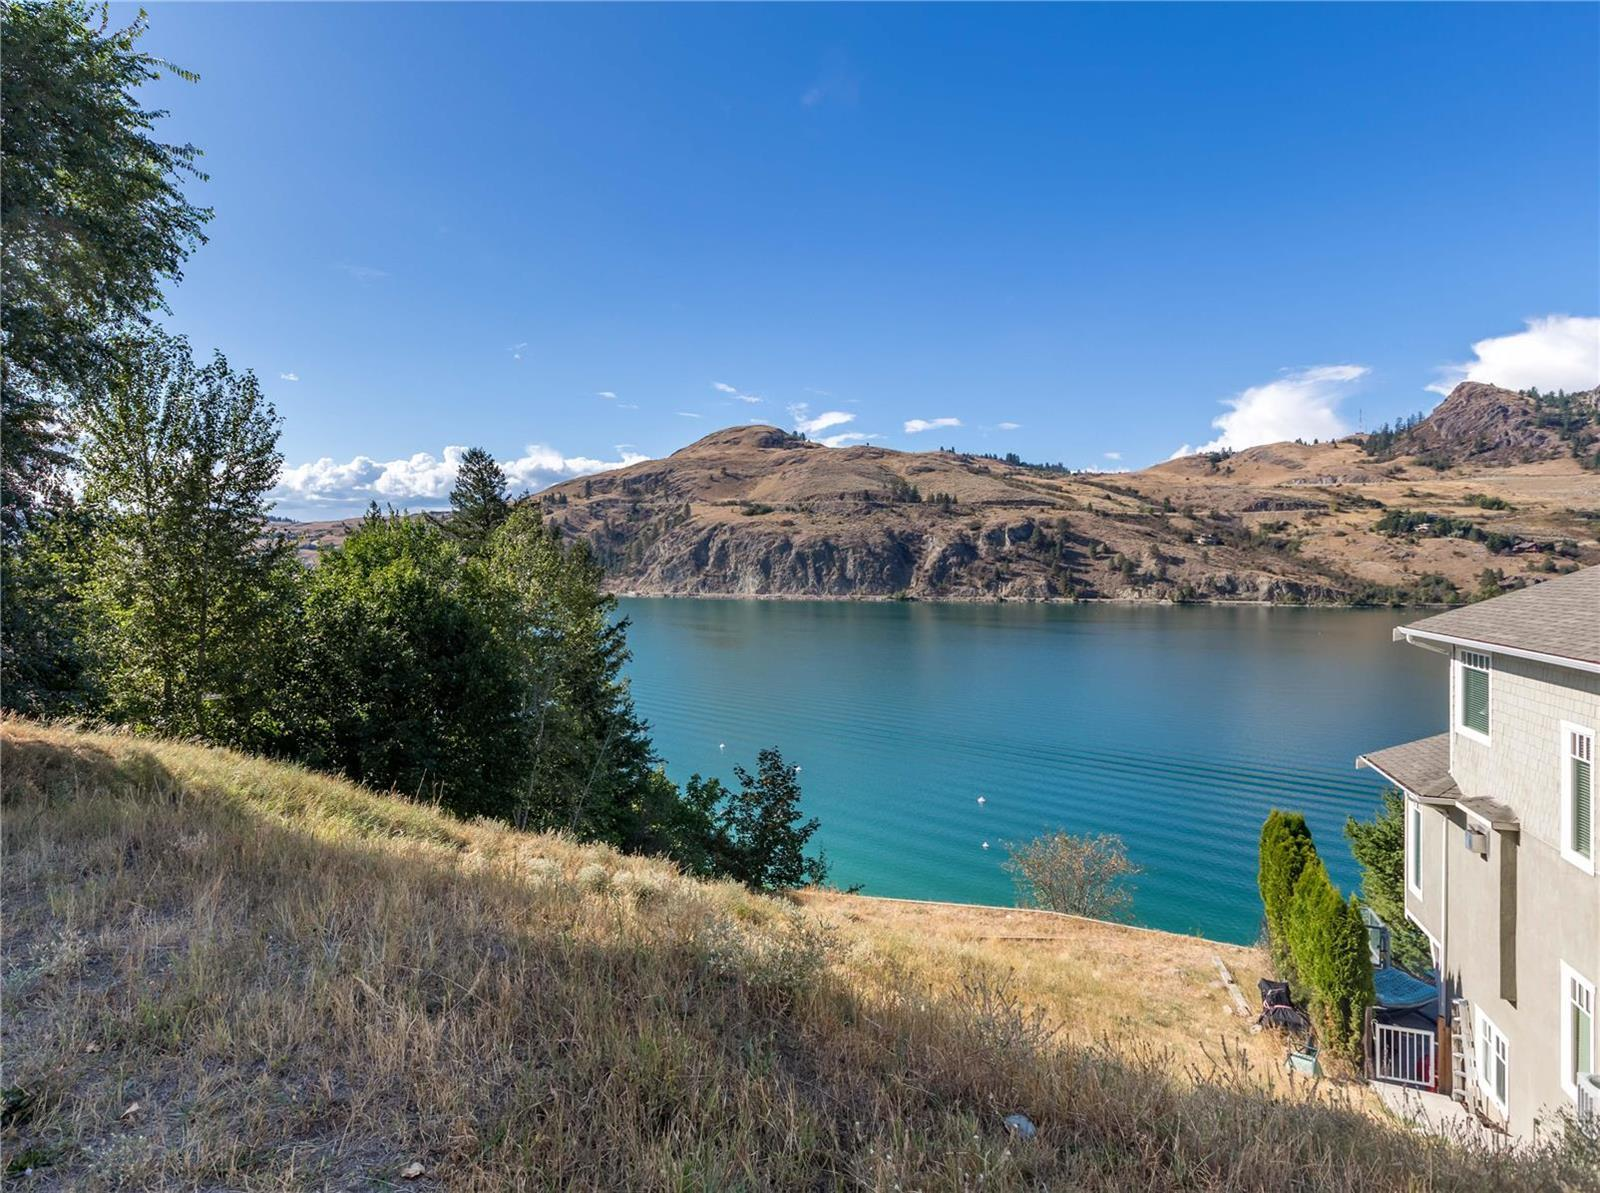 13940 Ponderosa Way,, Coldstream, British Columbia  V1B 1A4 - Photo 5 - 10216769